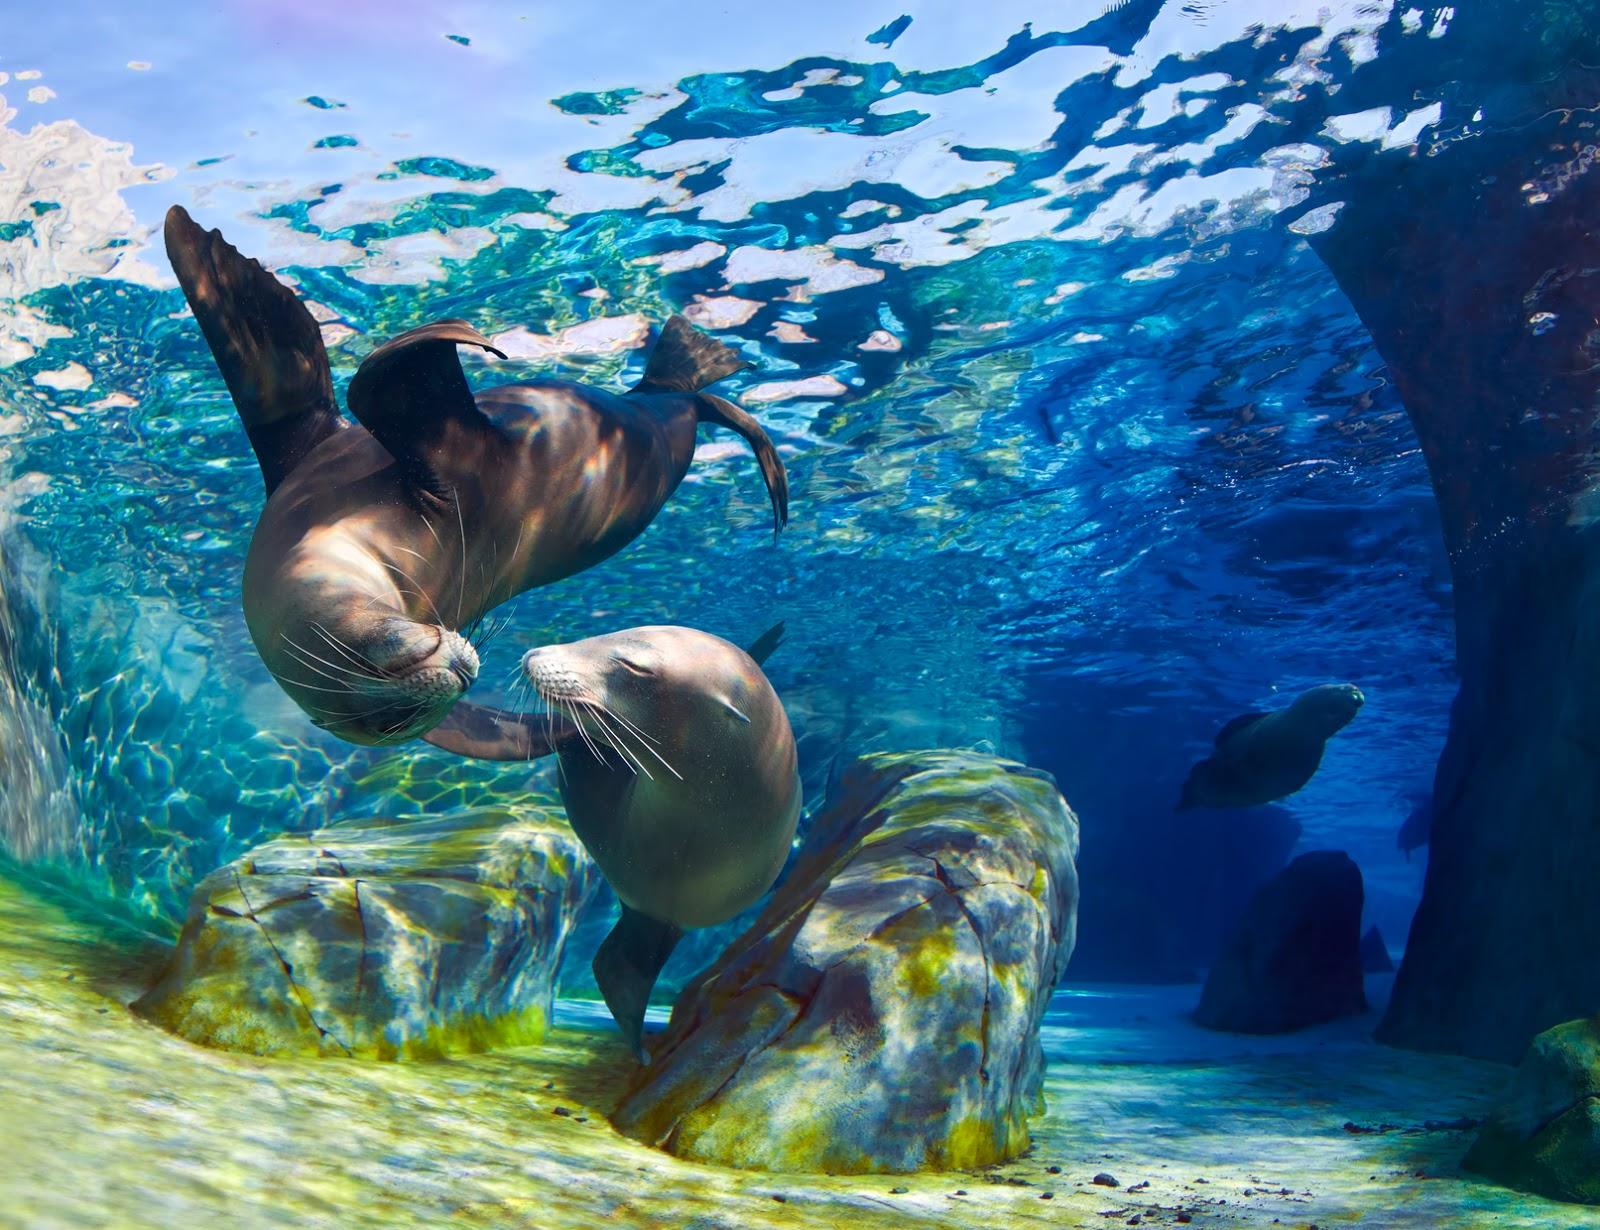 Vida en el mar on pinterest del mar angelfish and mars - Fotos fondo del mar ...